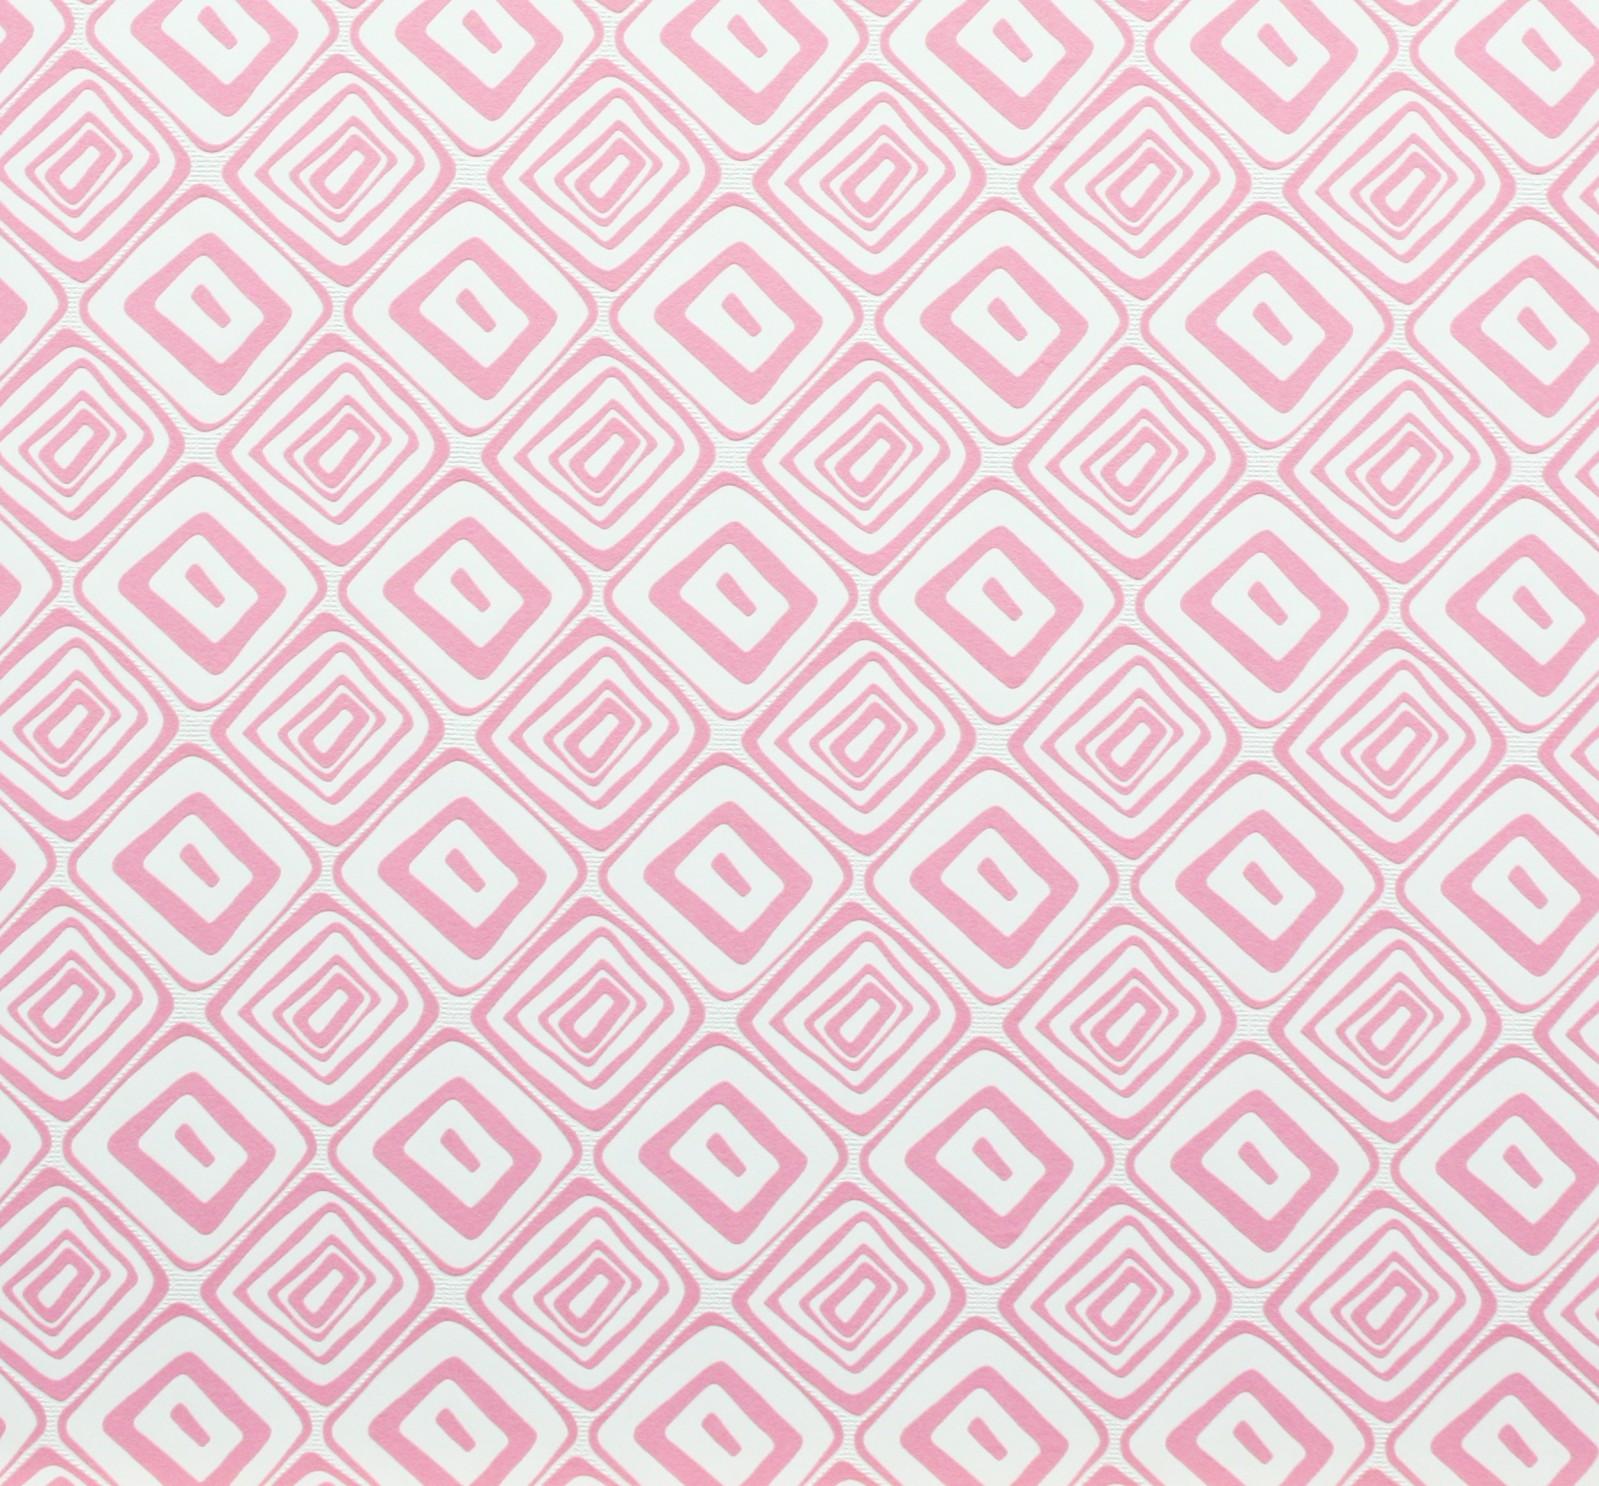 tapete panels marburg 51571 retro wei rosa vliestapete 2. Black Bedroom Furniture Sets. Home Design Ideas